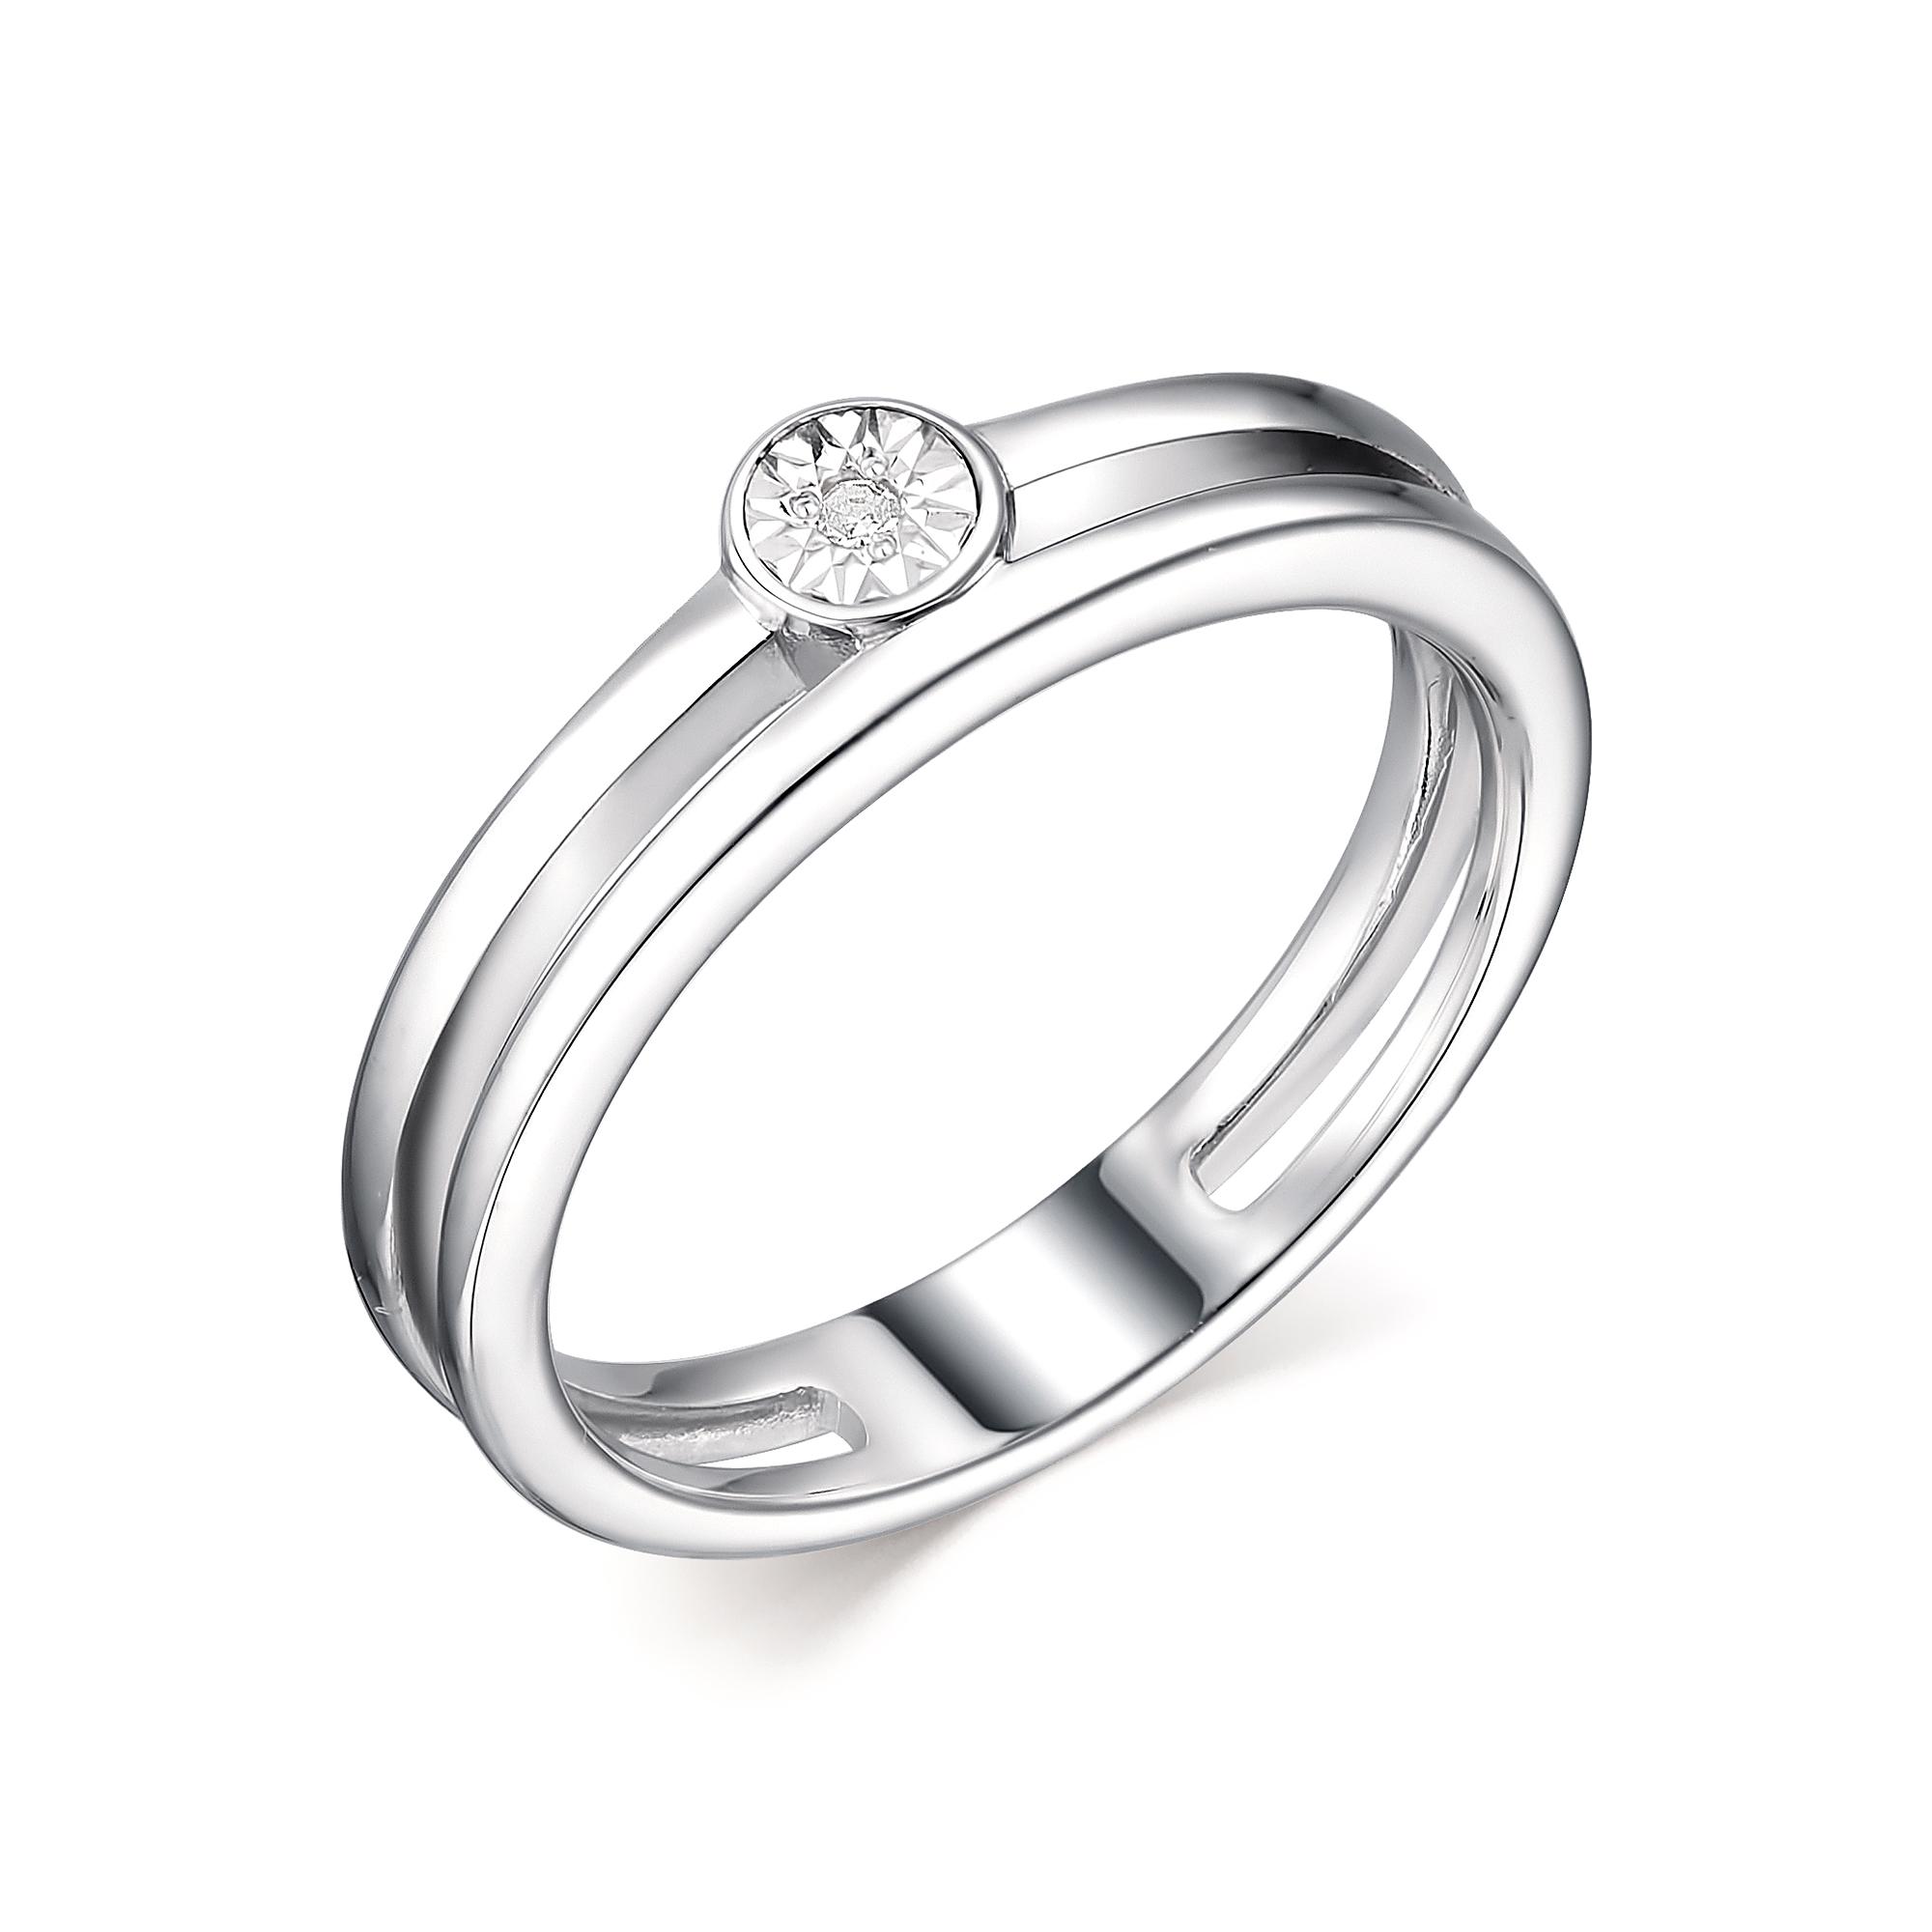 Серебряное кольцо АЛЬКОР с бриллиантом 01-1919/000Б-00